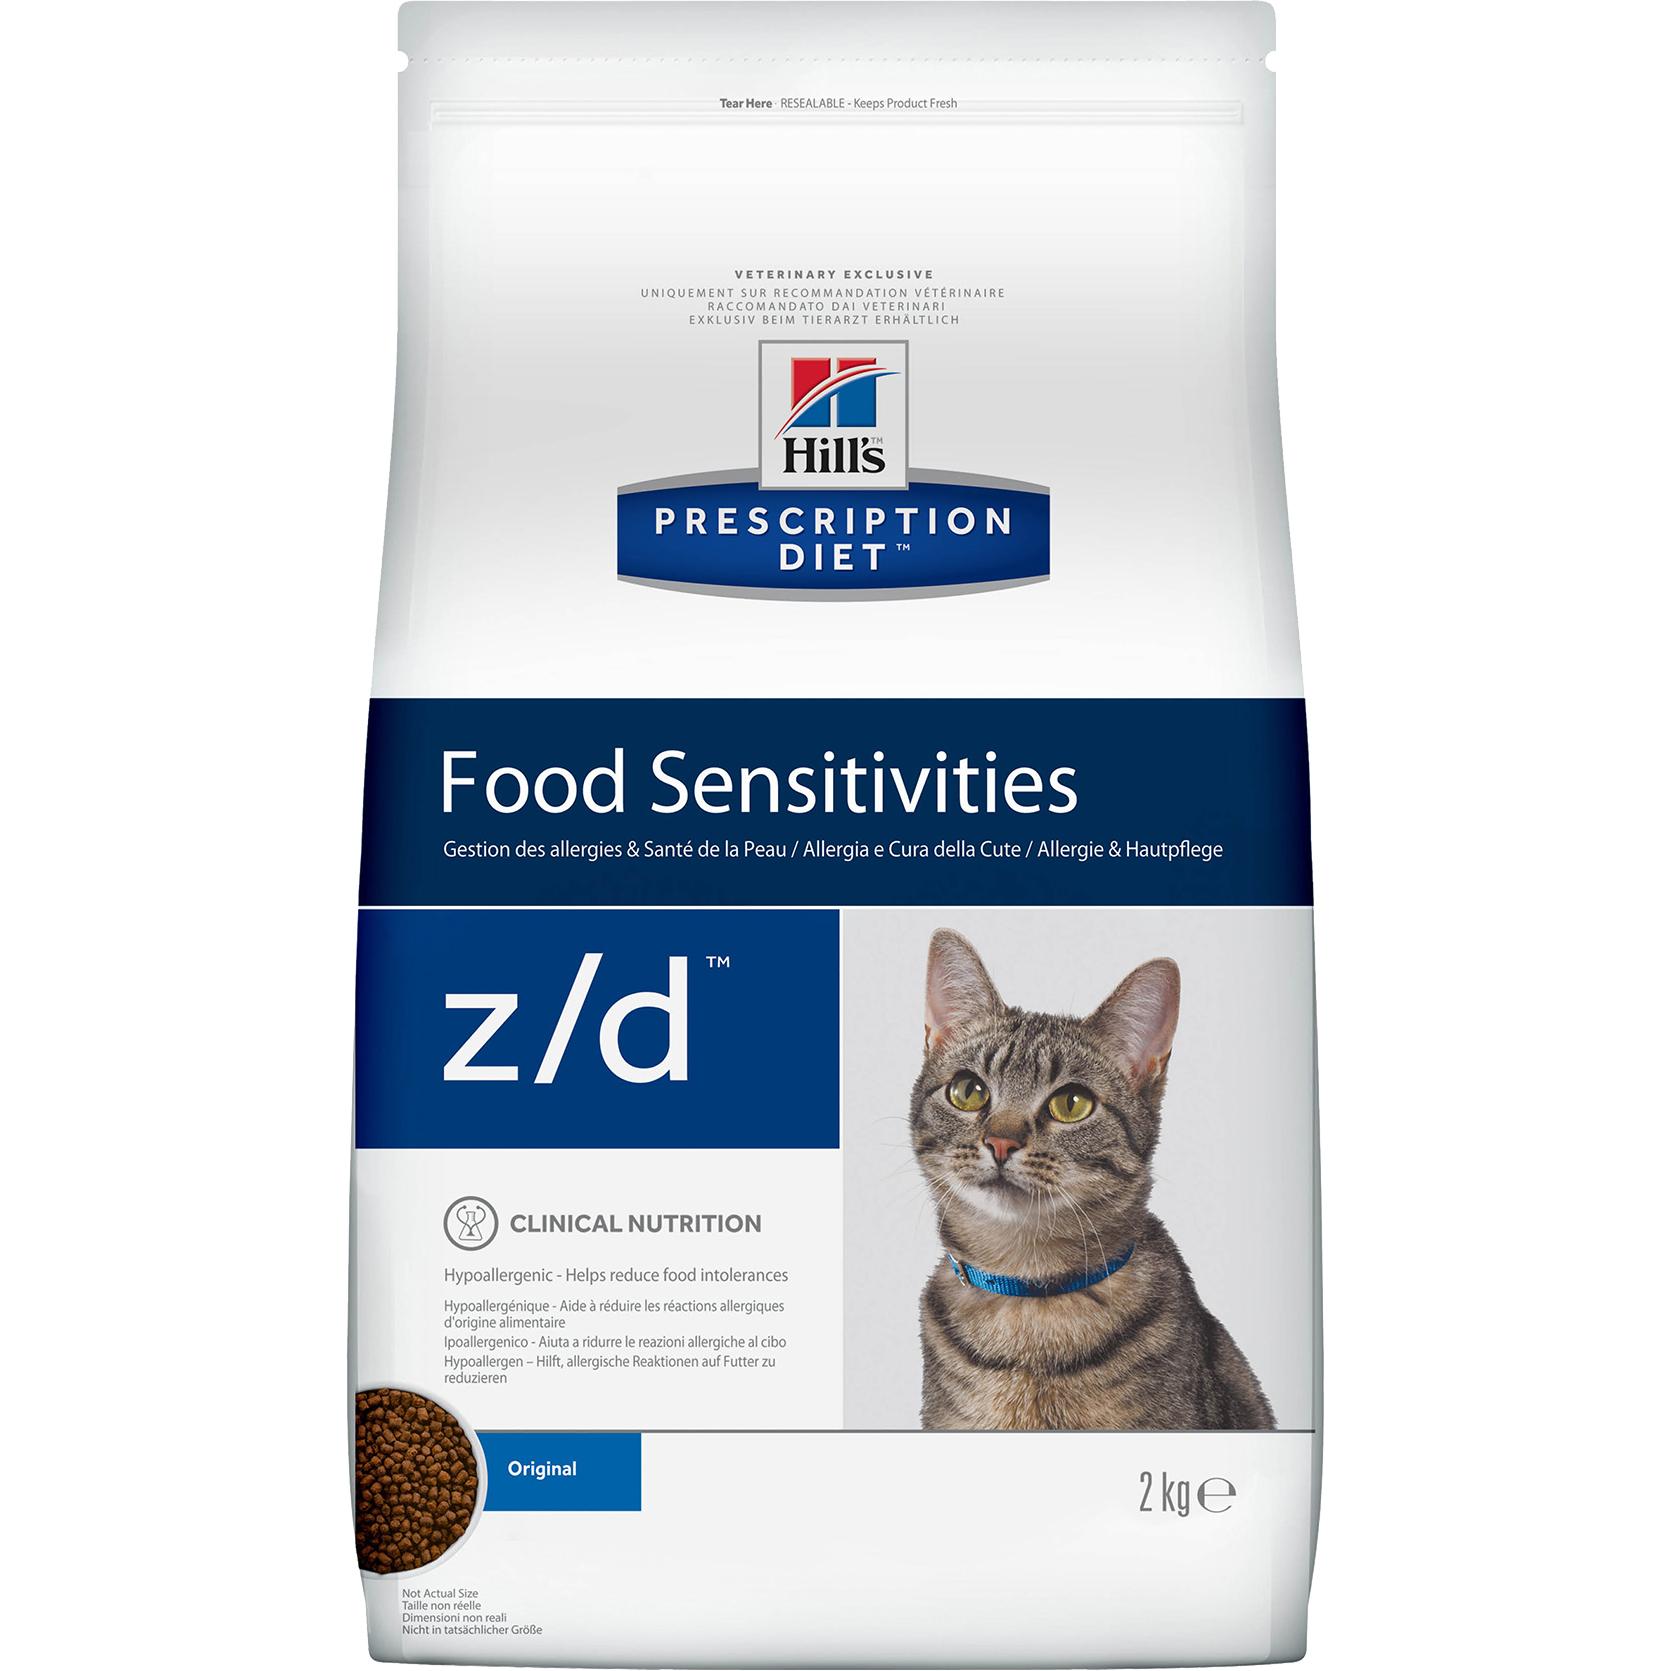 Корм для кошек Hills Prescription Diet z/d Food Sensitivities 2 кг